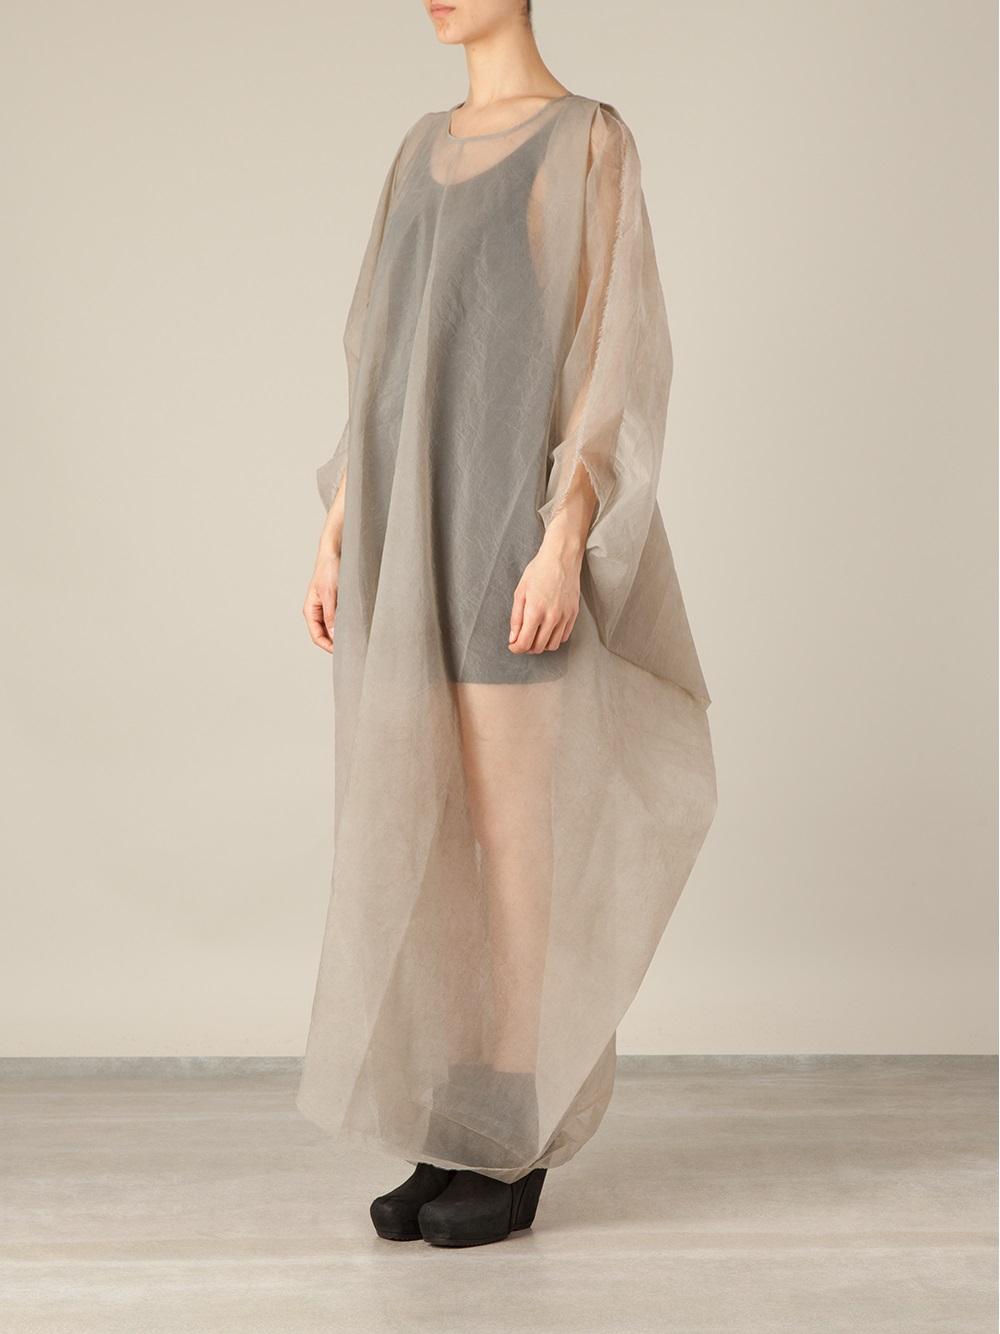 DRESSES - Short dresses Uma Wang jz7BEP